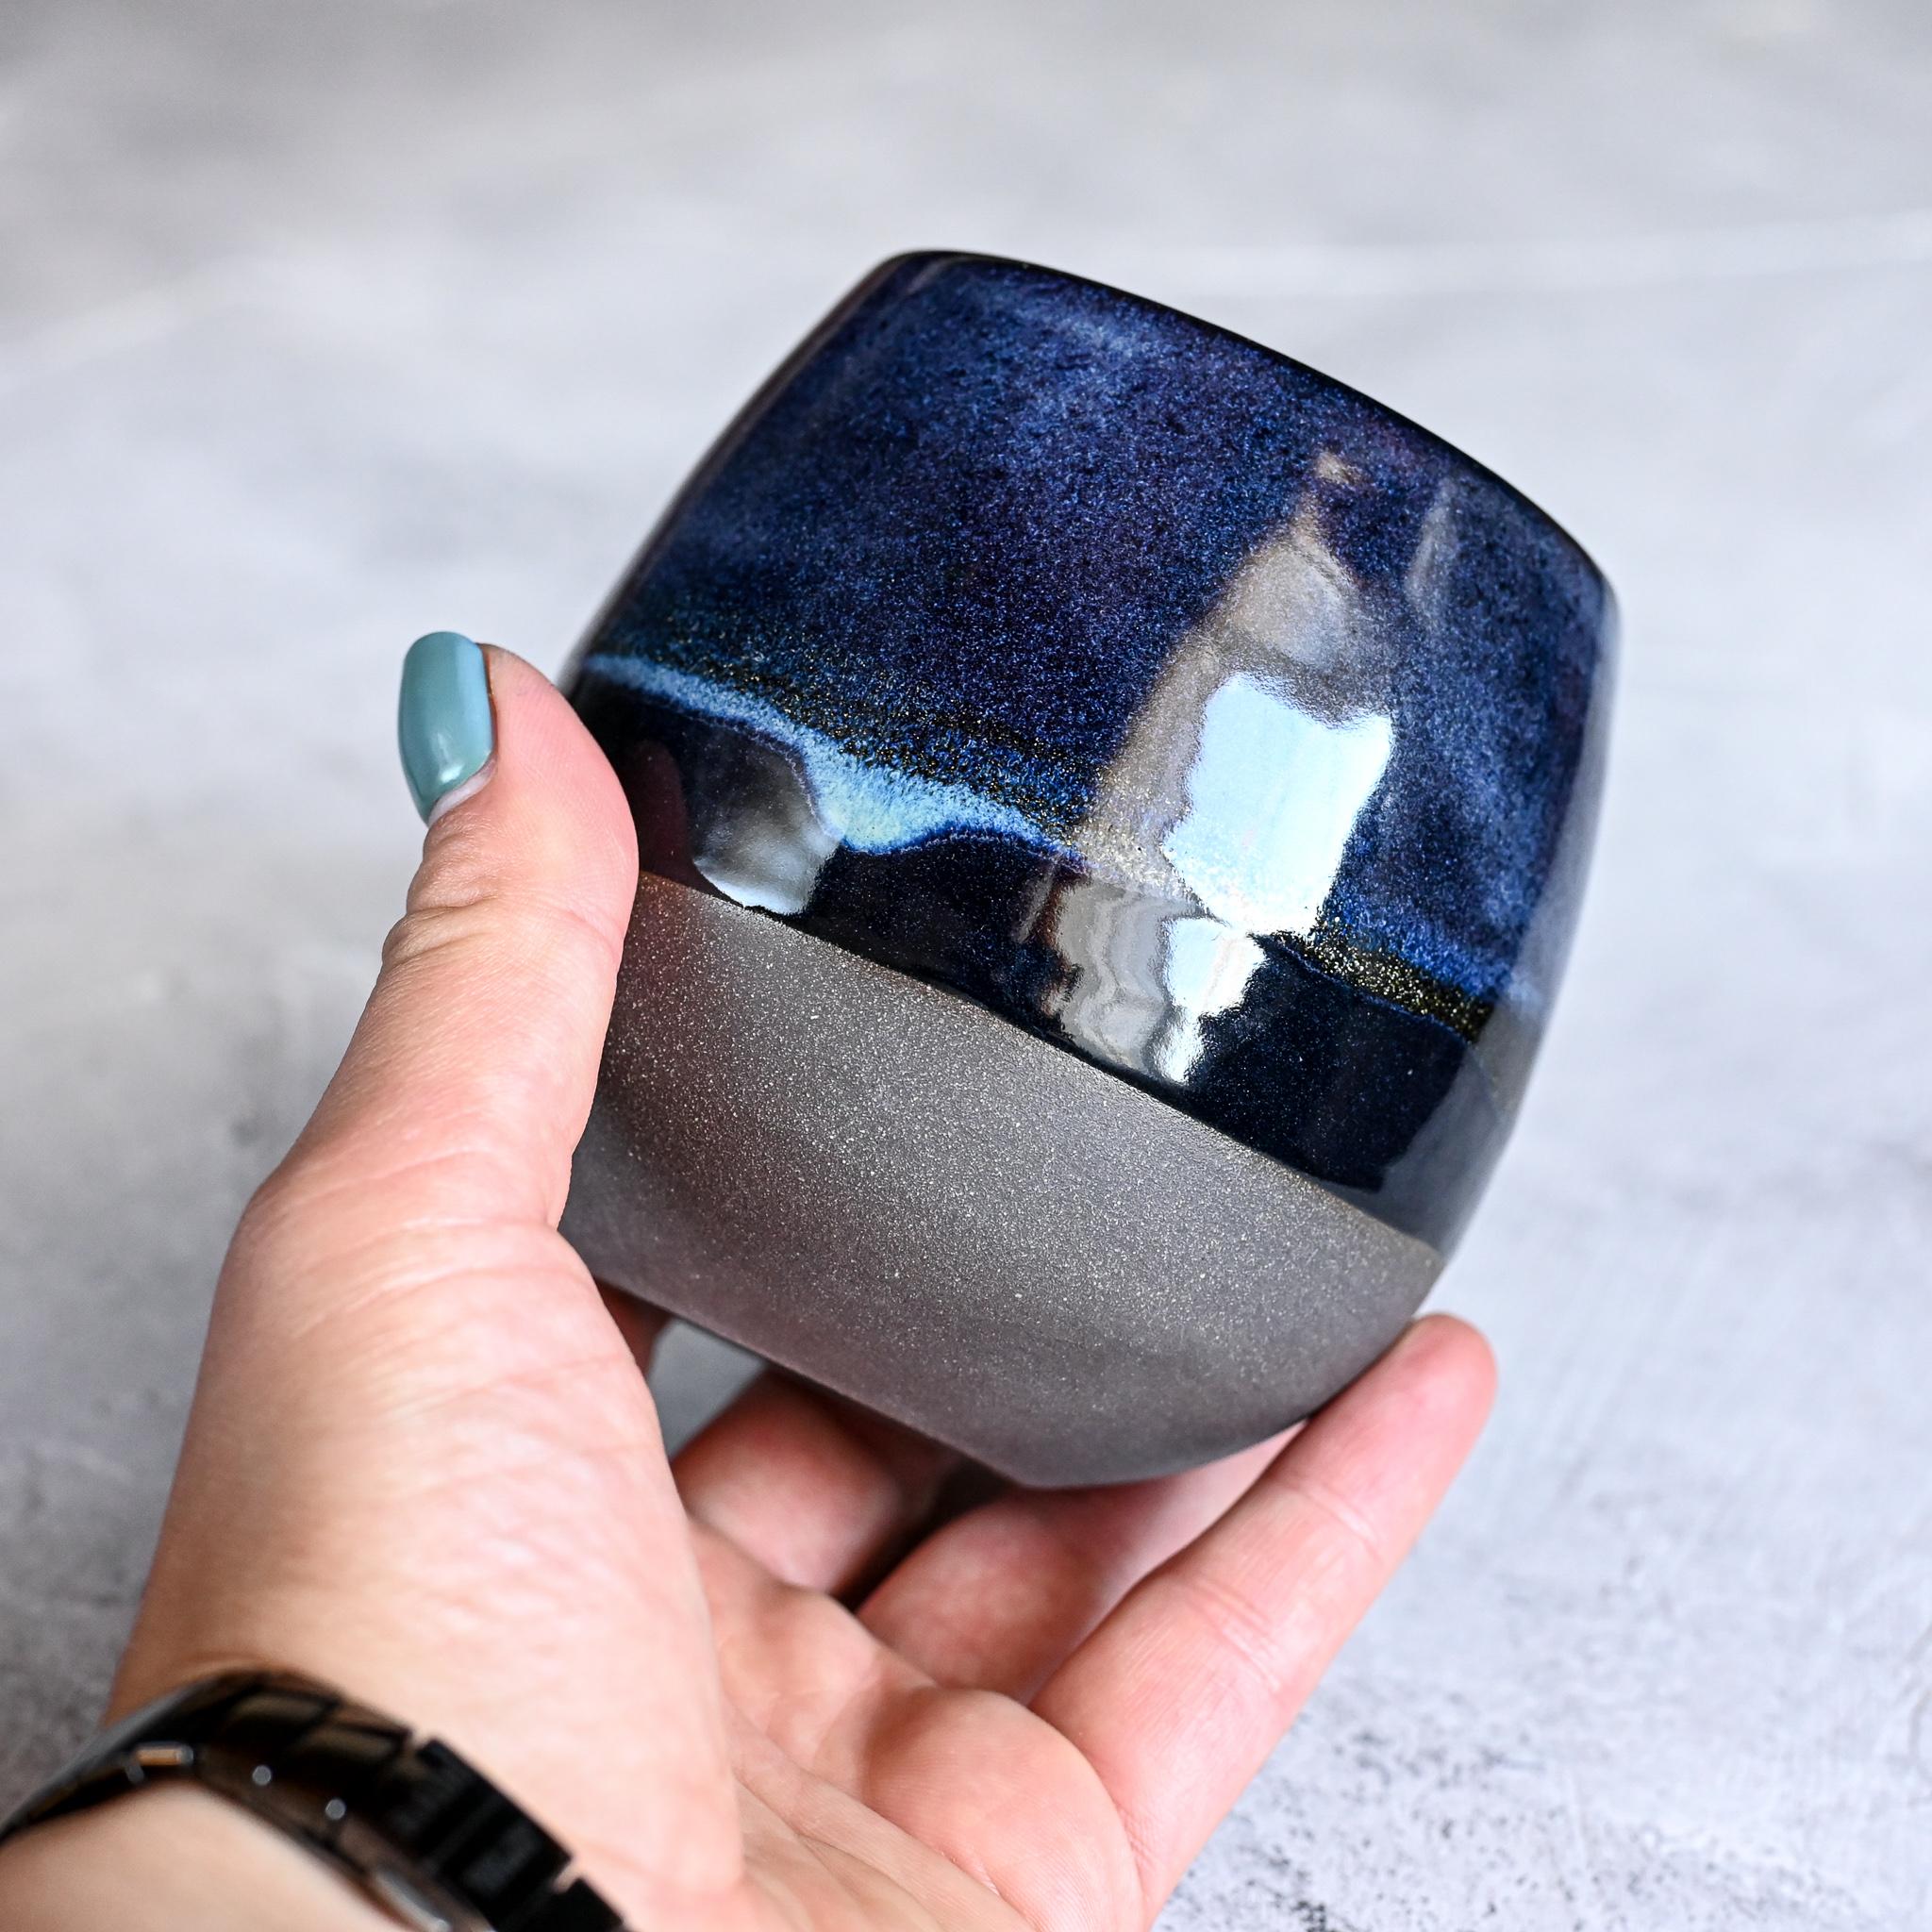 "картинка Керамический стакан Марии Левиной ""Космос"" 16 - DishWishes.Ru"